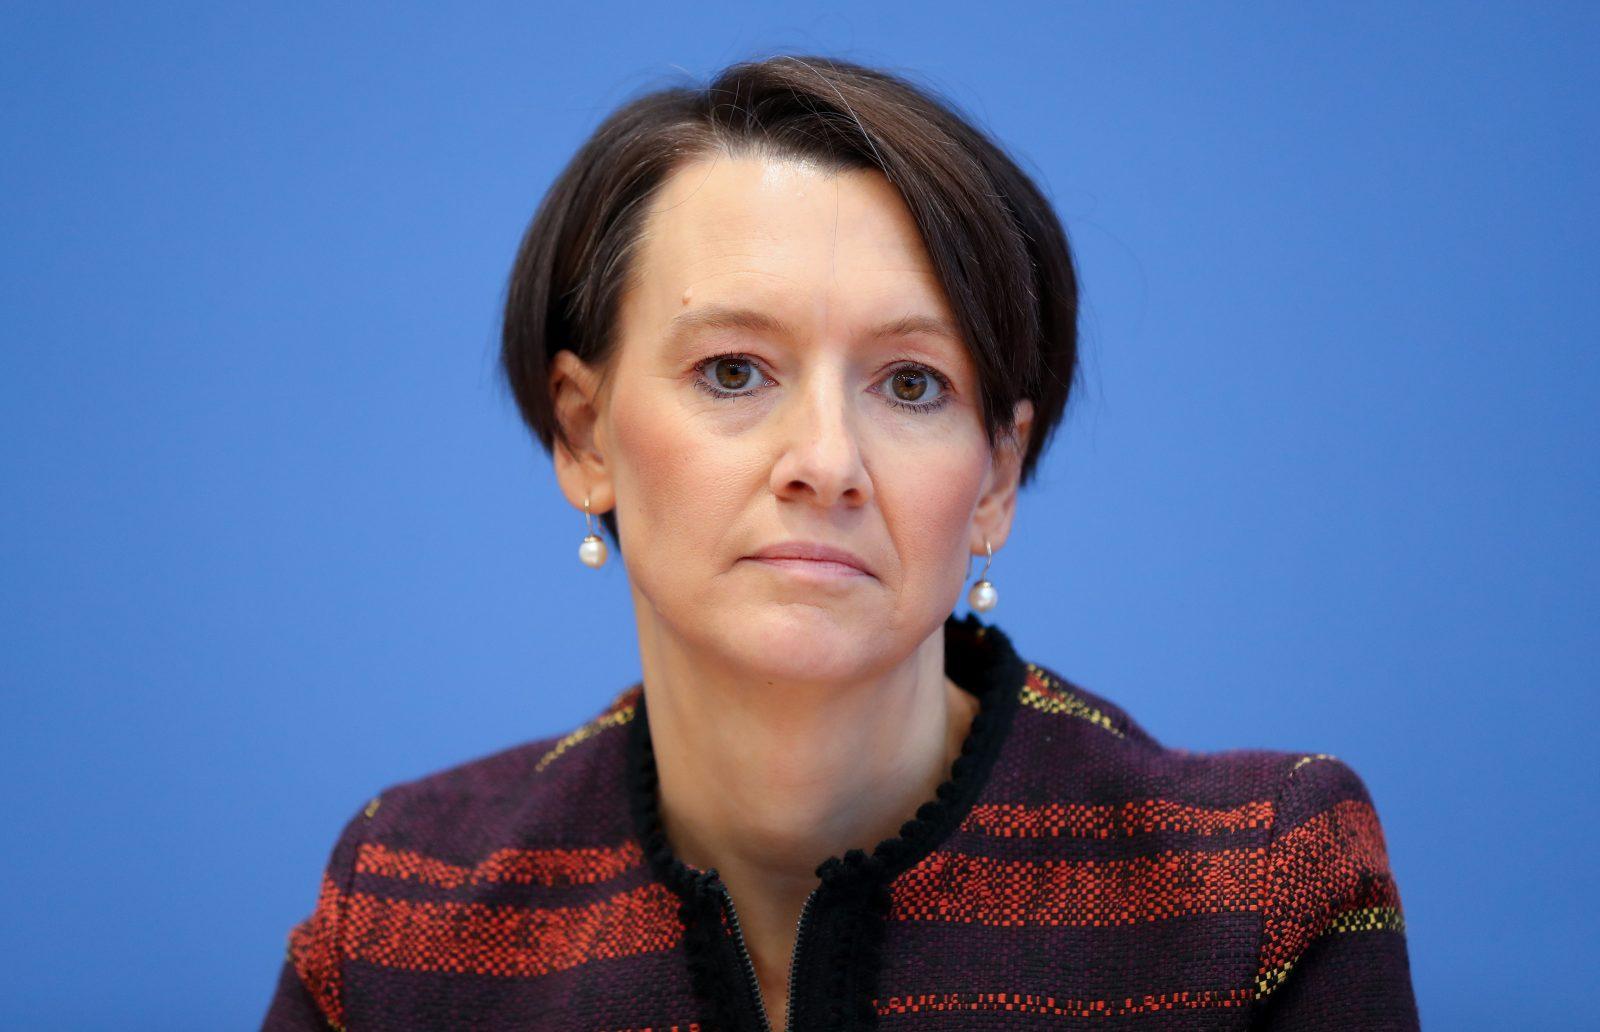 Bremens Bildungssenatorin Claudia Bogedan (SPD) hebt die Mathe-Abiturnoten an (Archivbild) Foto: (c) dpa